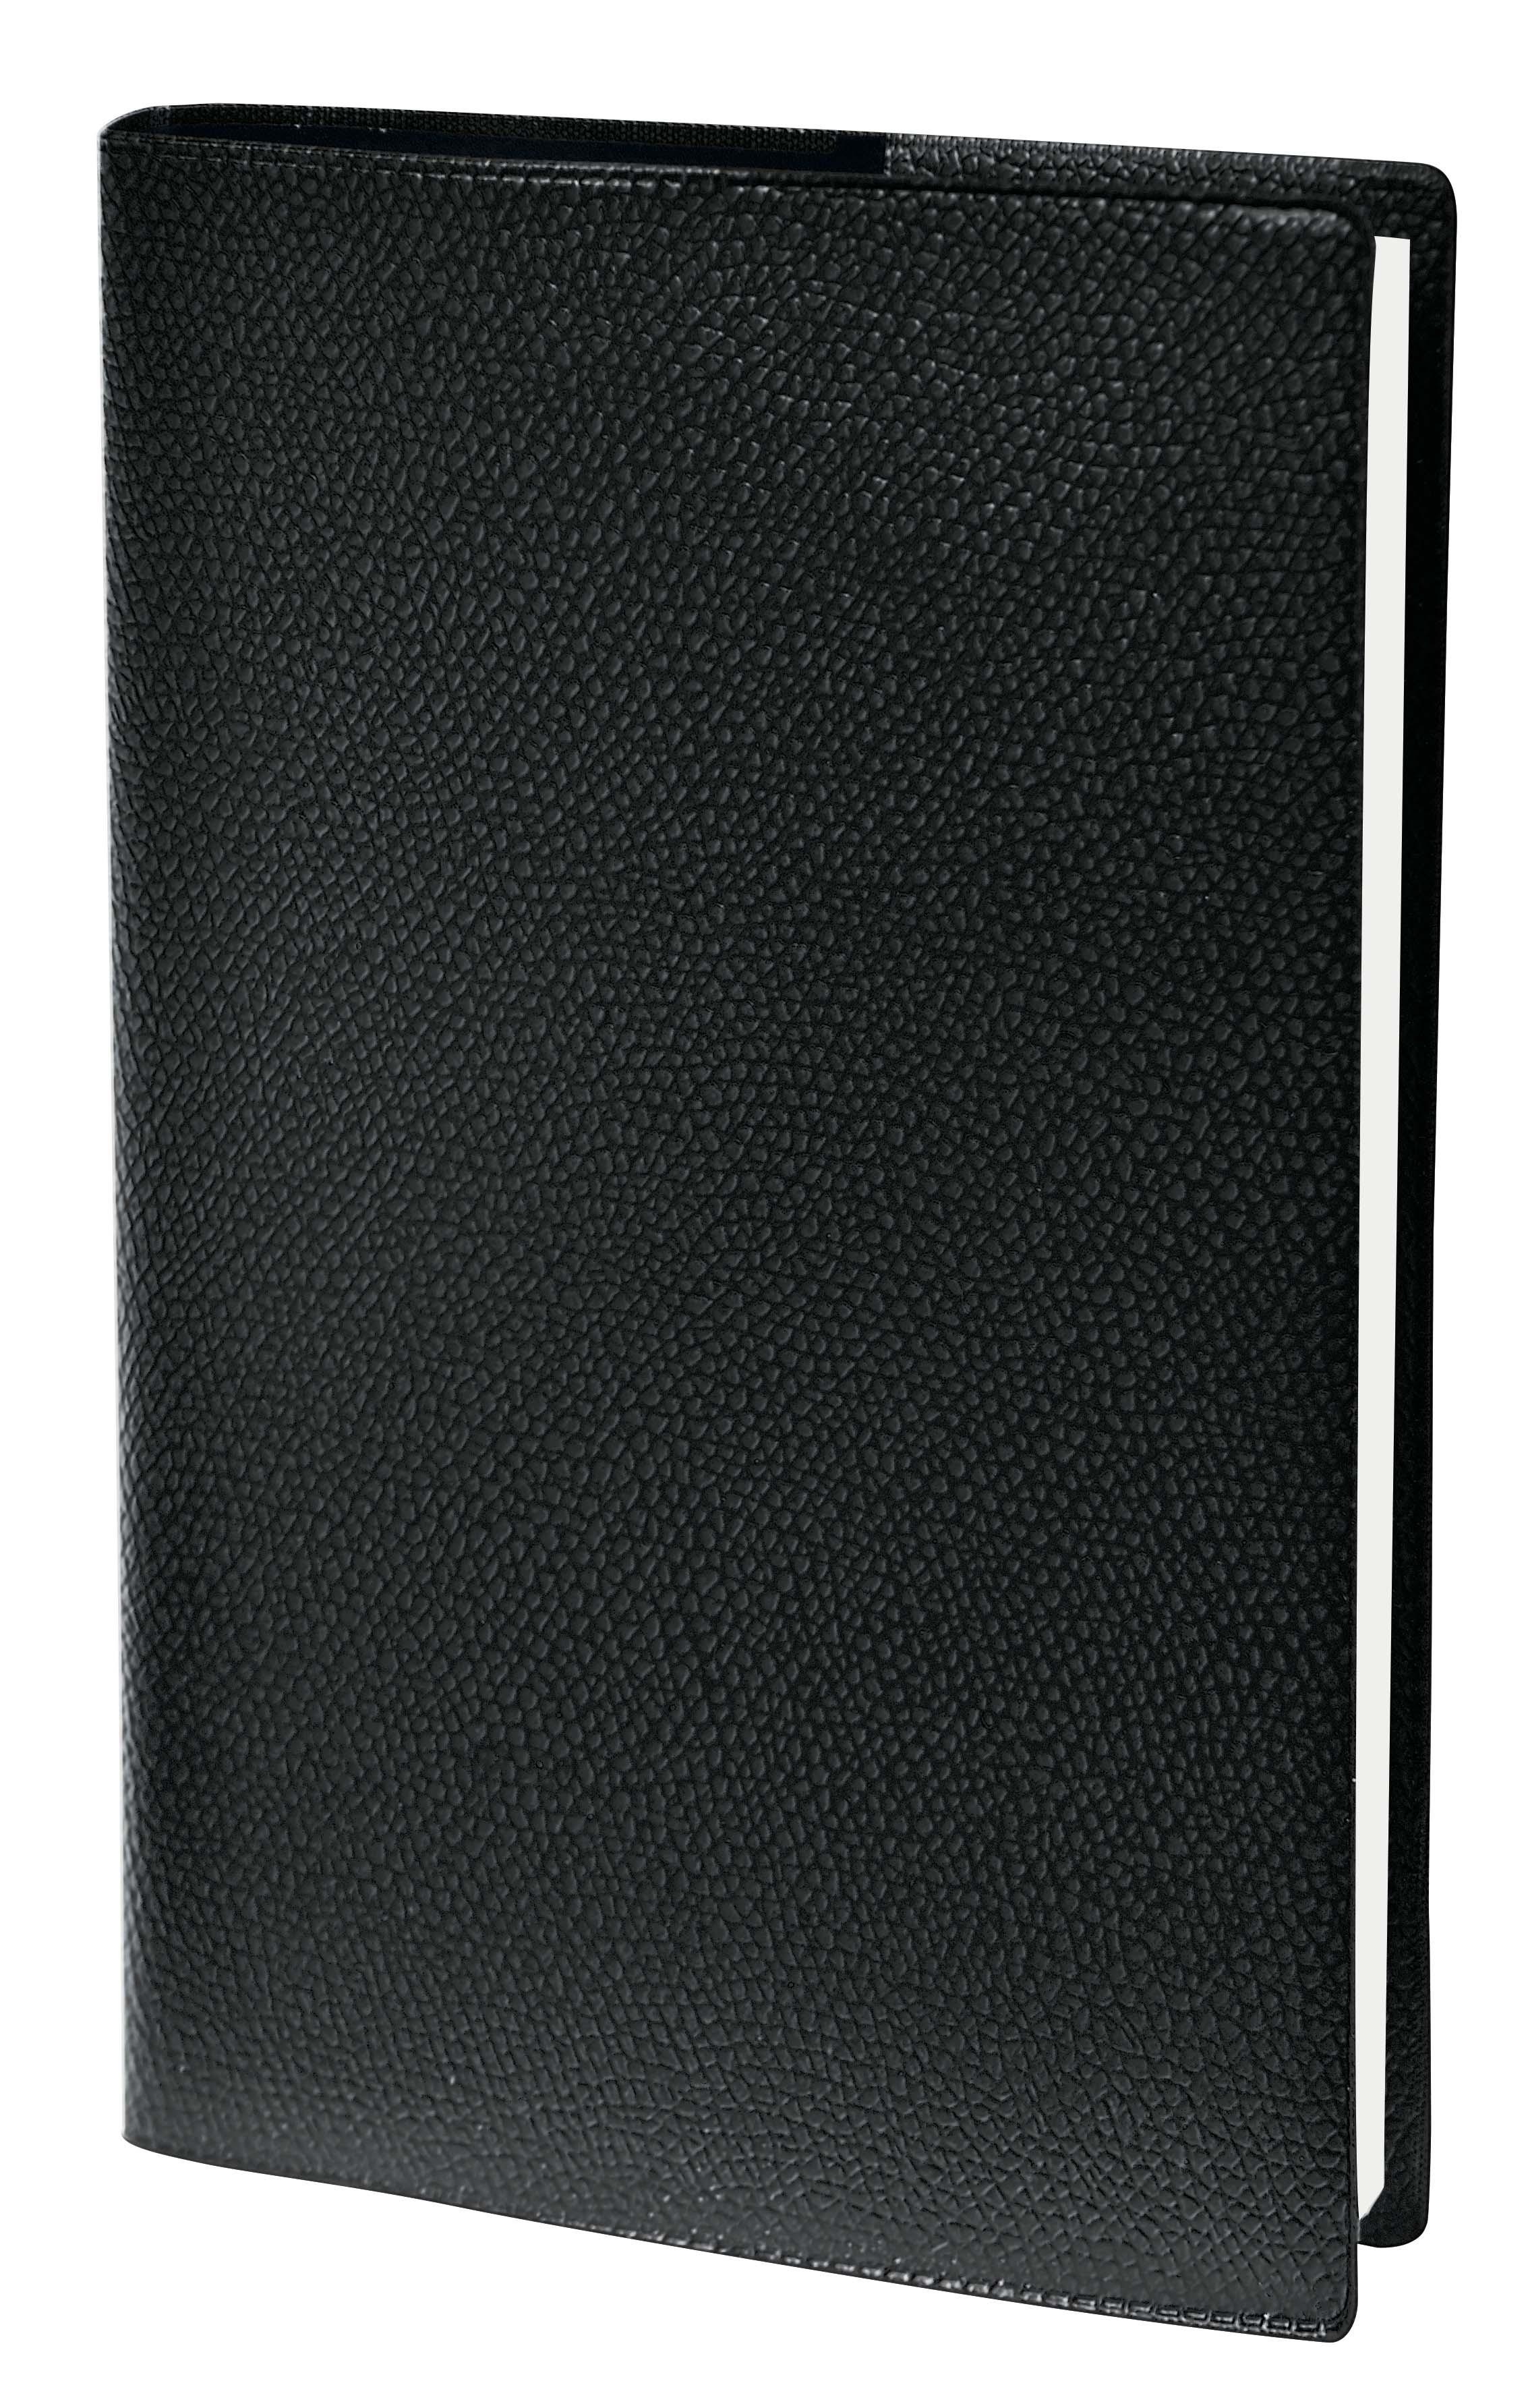 Agenda Impala Planning SD - 1 semaine sur 2 pages - 18 x 24 cm - noir - Quo Vadis